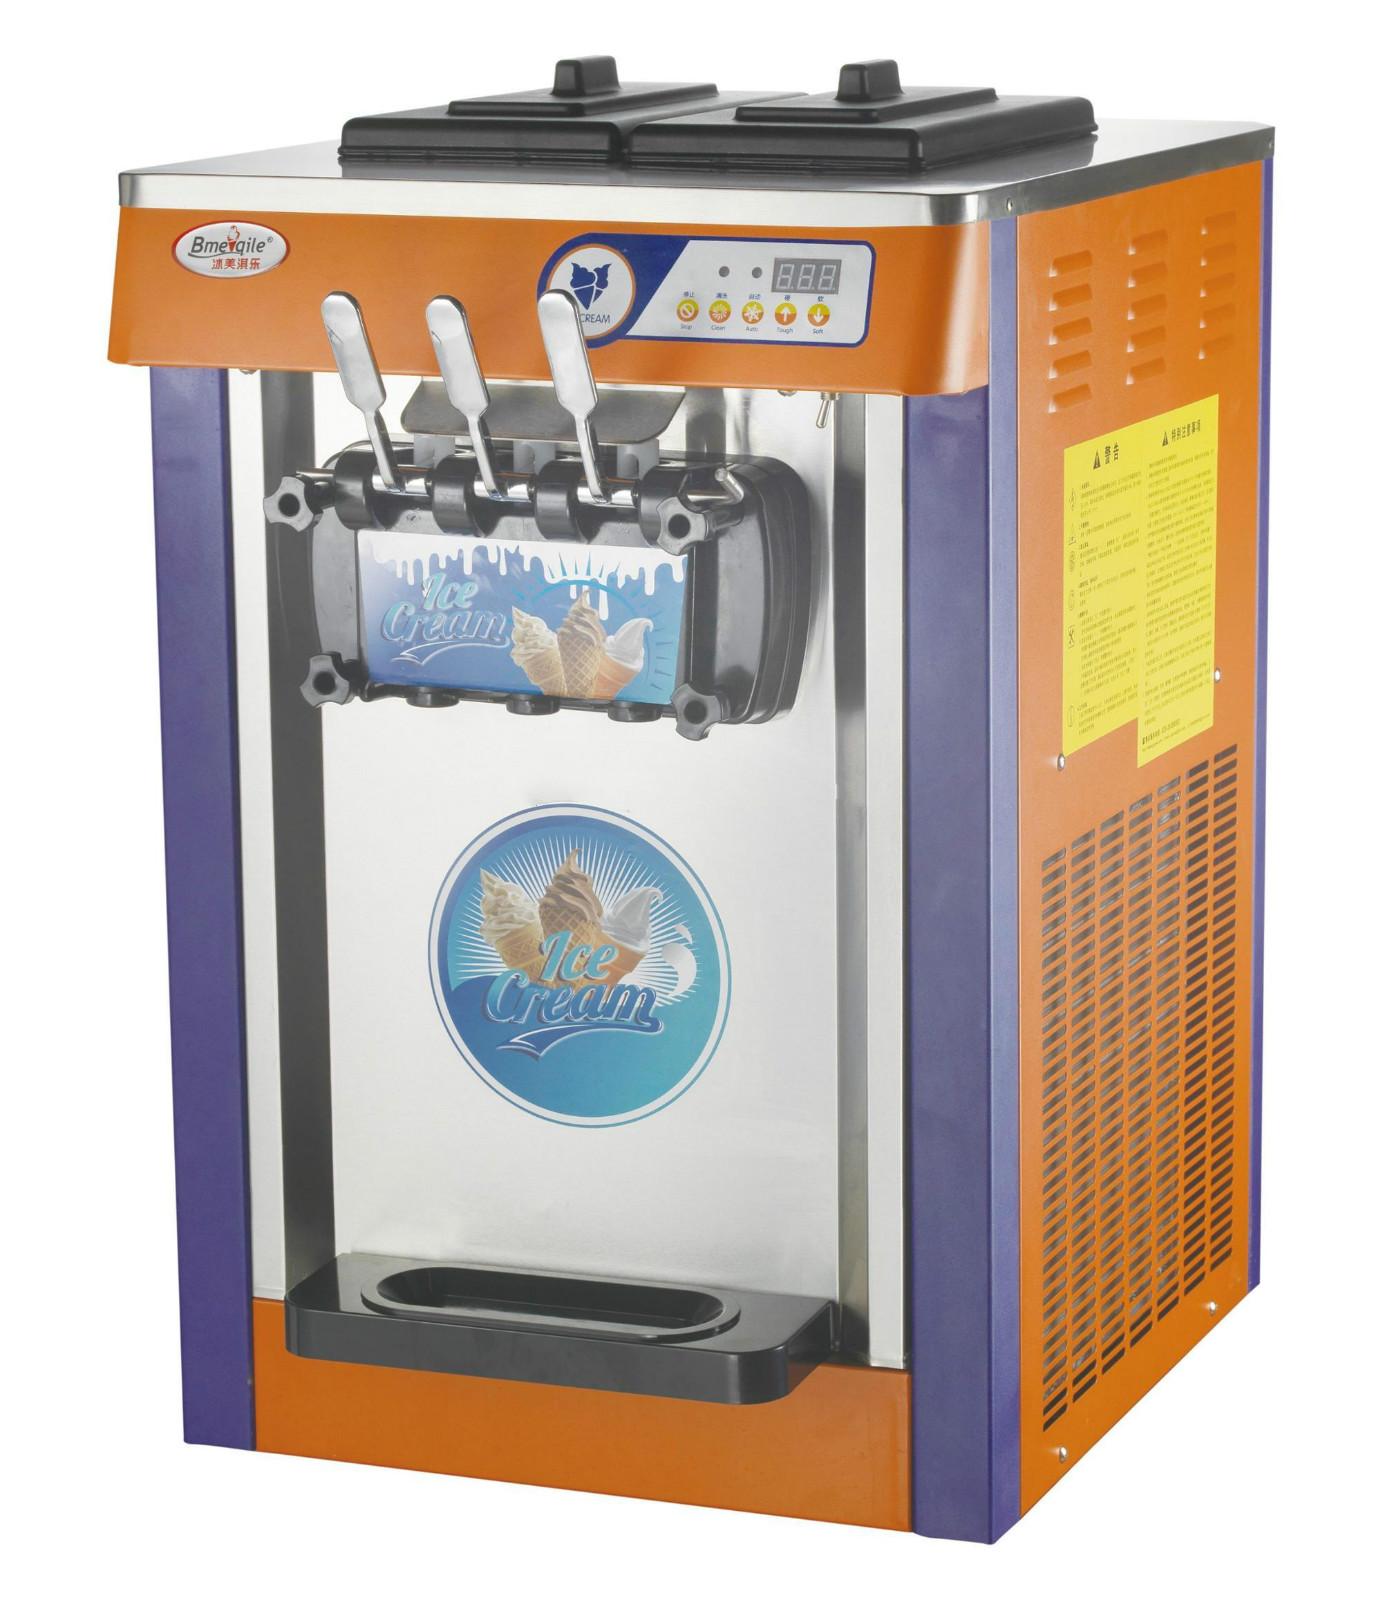 industrial turkish ice cream machine counter top soft ice cream maker machine price sale